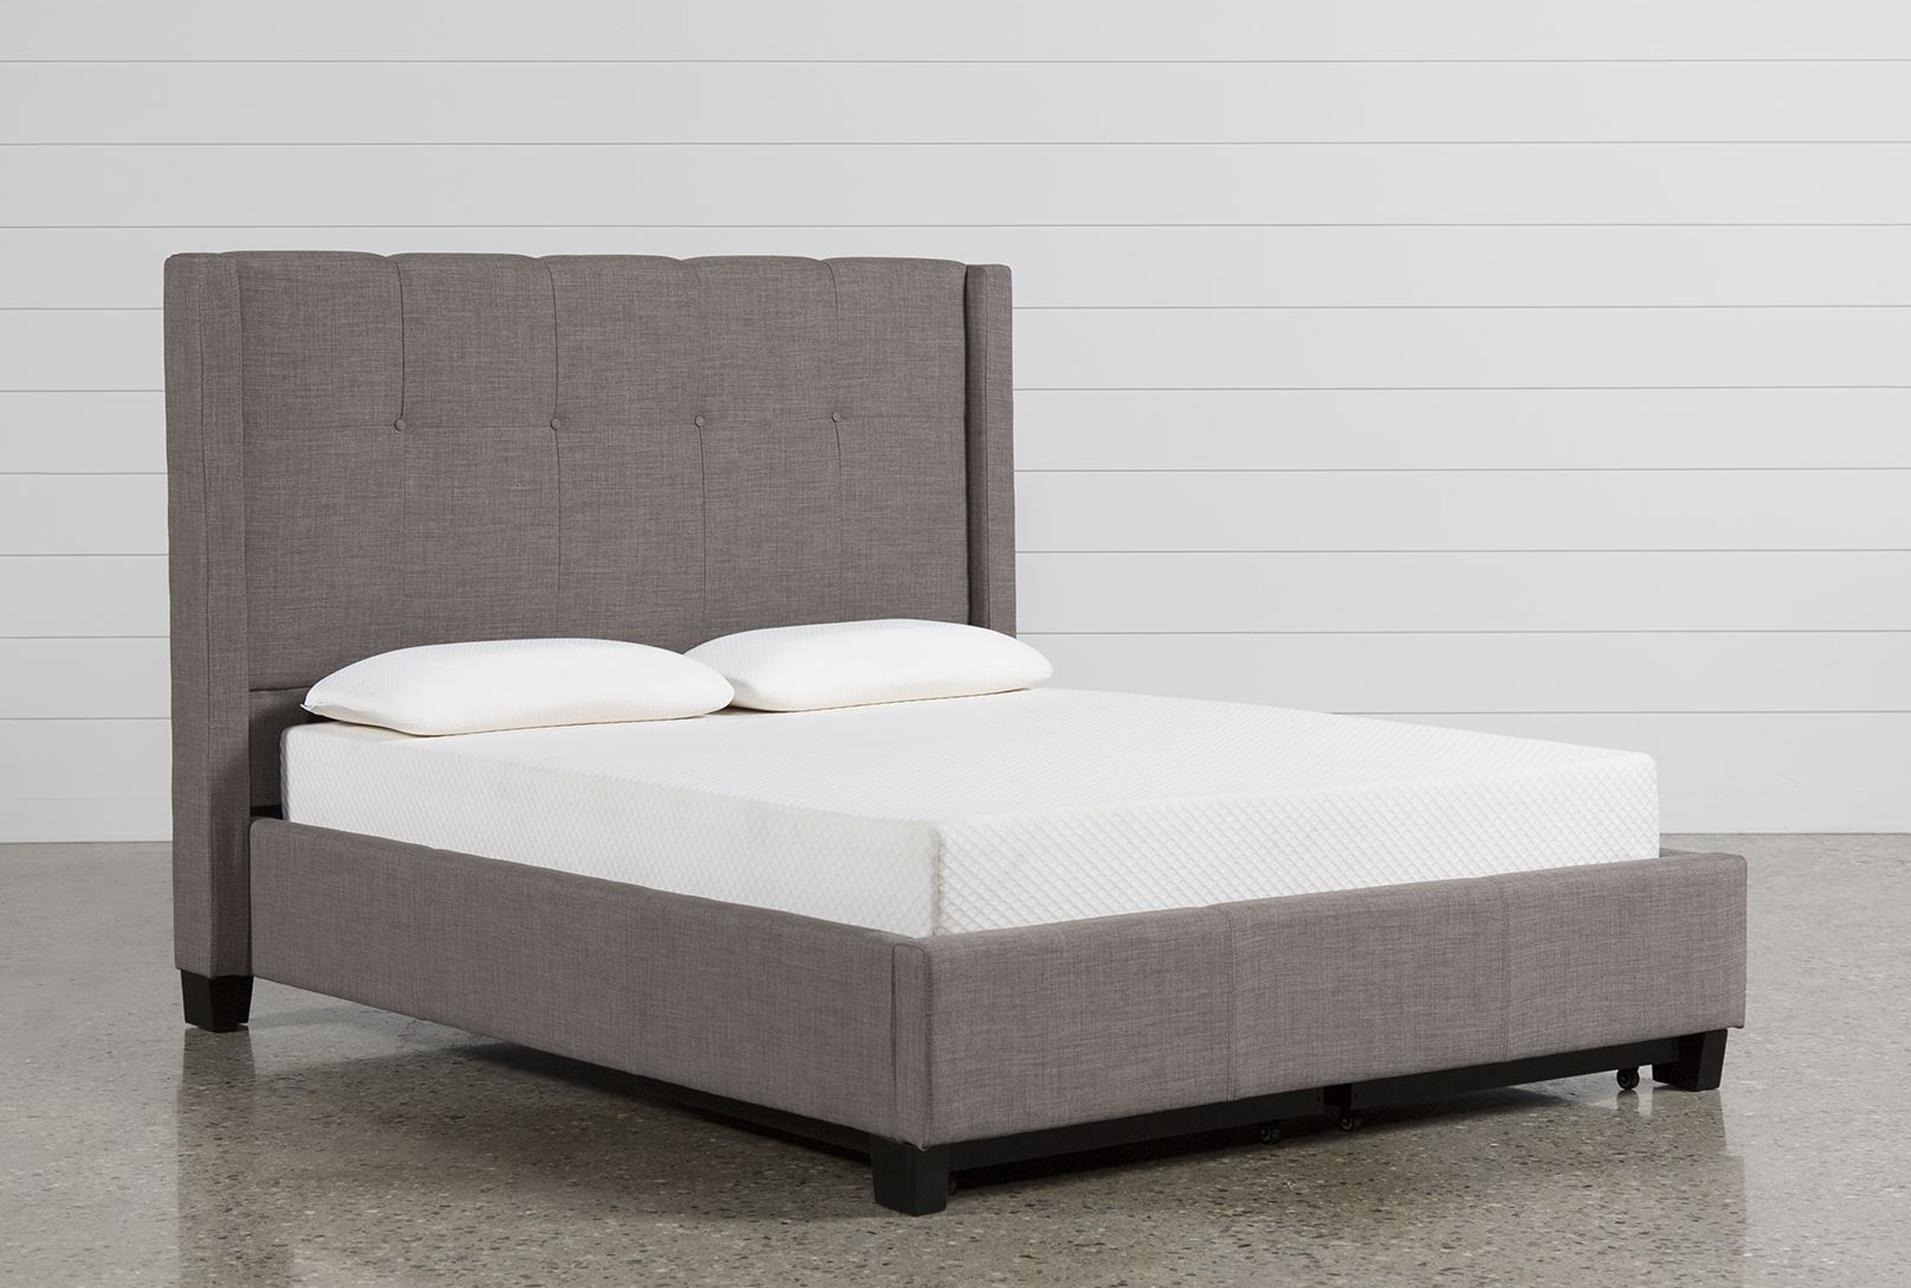 Genial Damon Stone California King Upholstered Platform Bed W/Storage   360